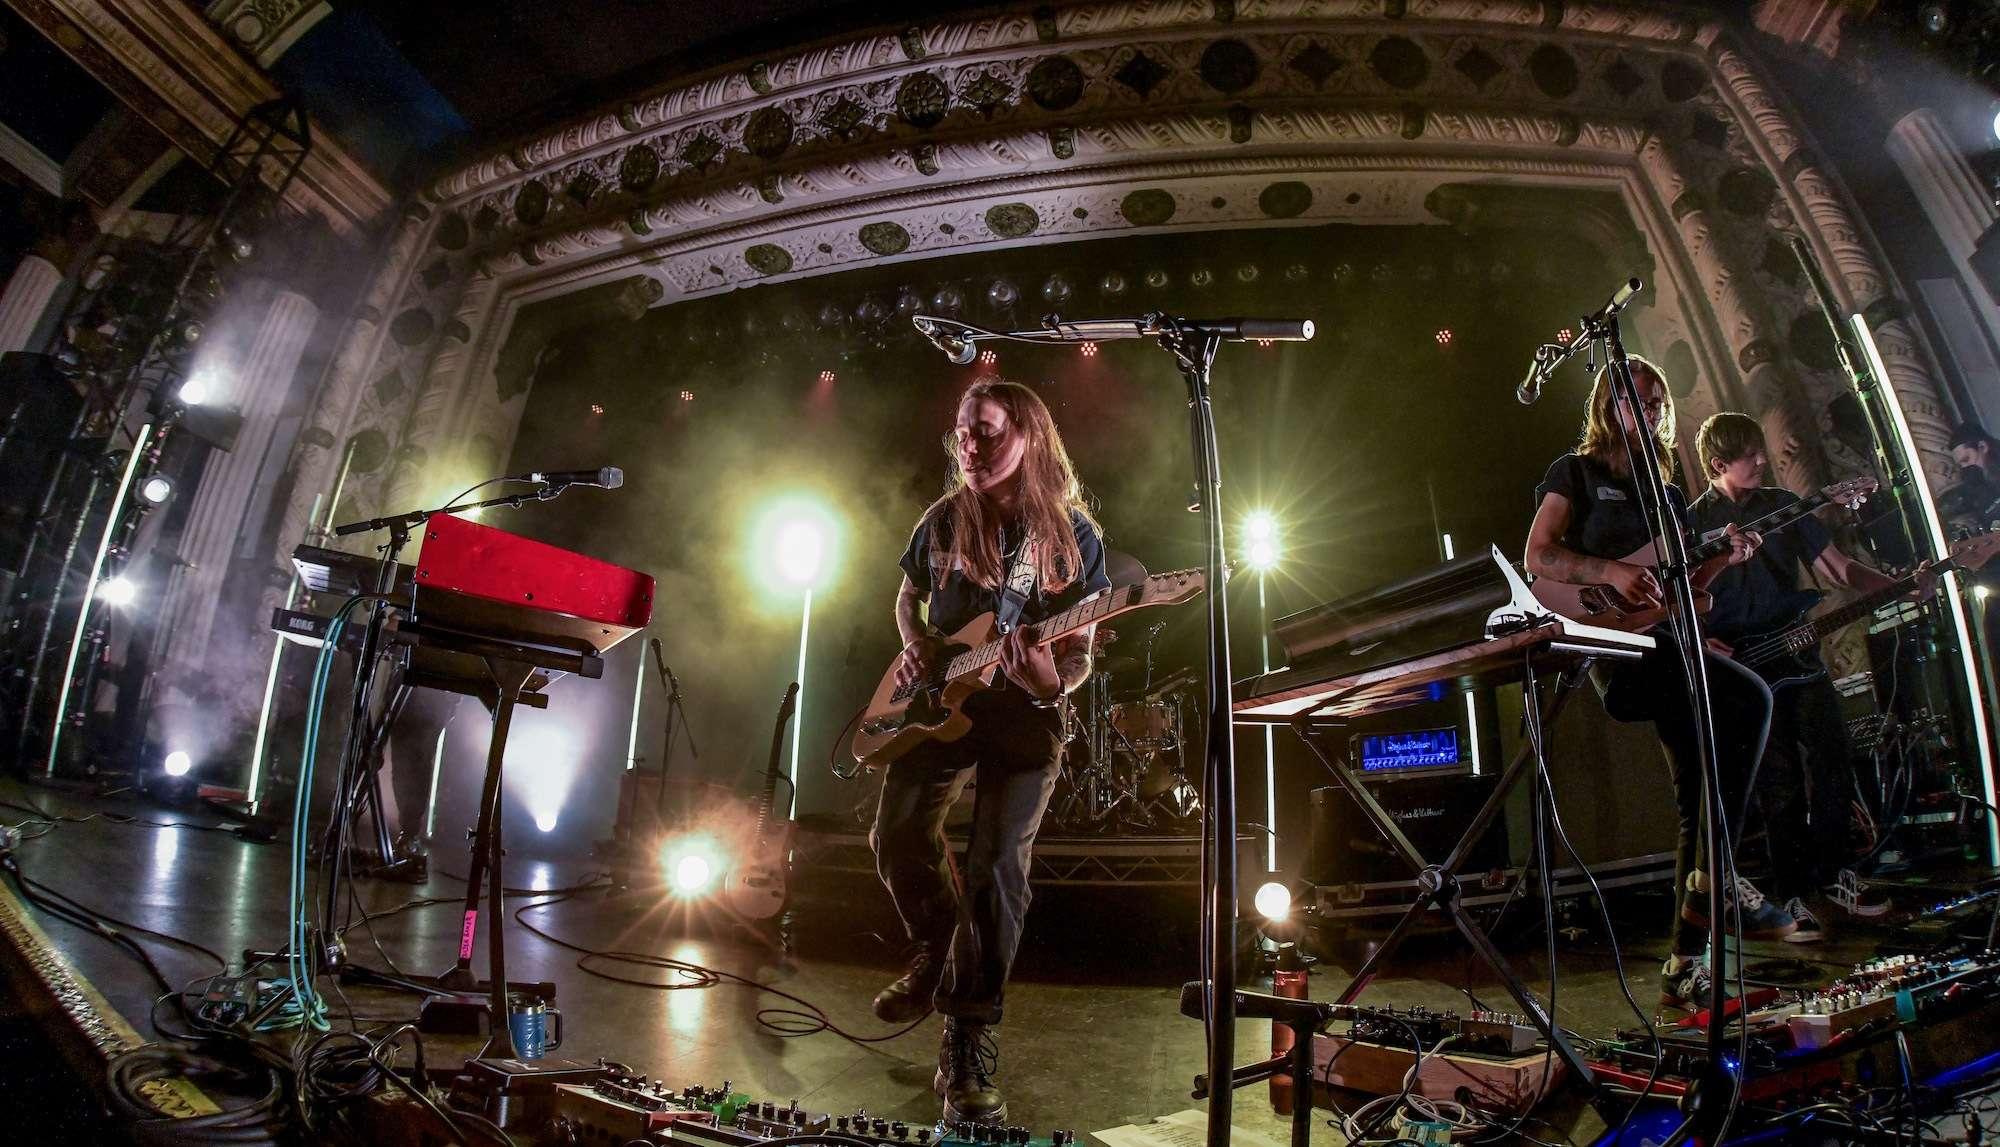 Julien Baker Live at Metro [GALLERY] 10